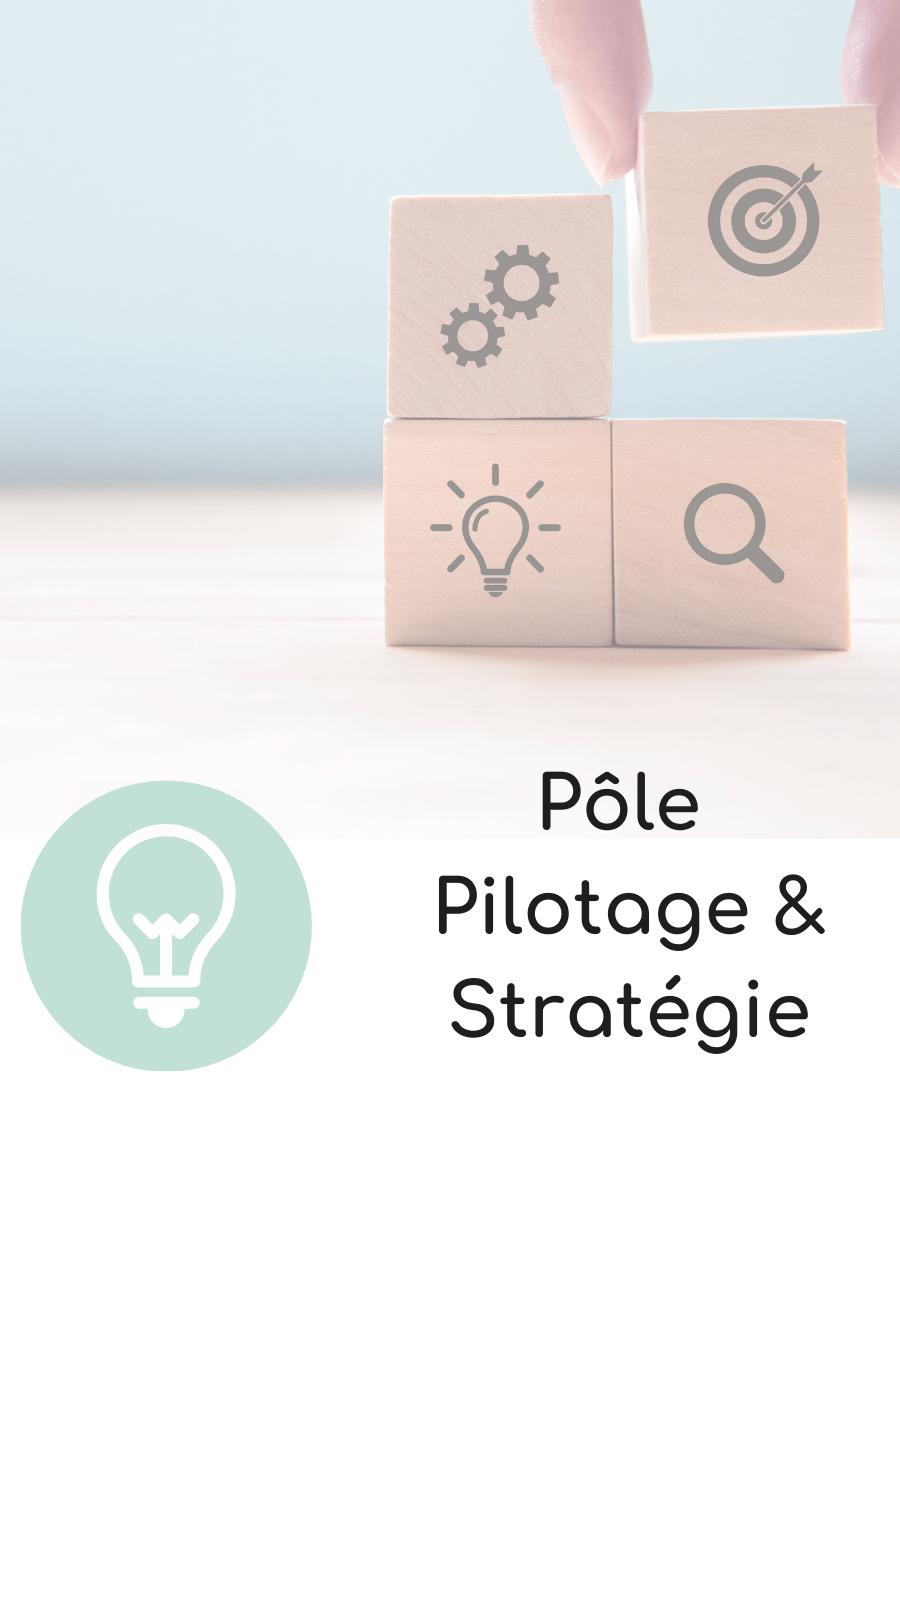 offre-pole-pilotage-strategie-entreprise-gestion-back-office